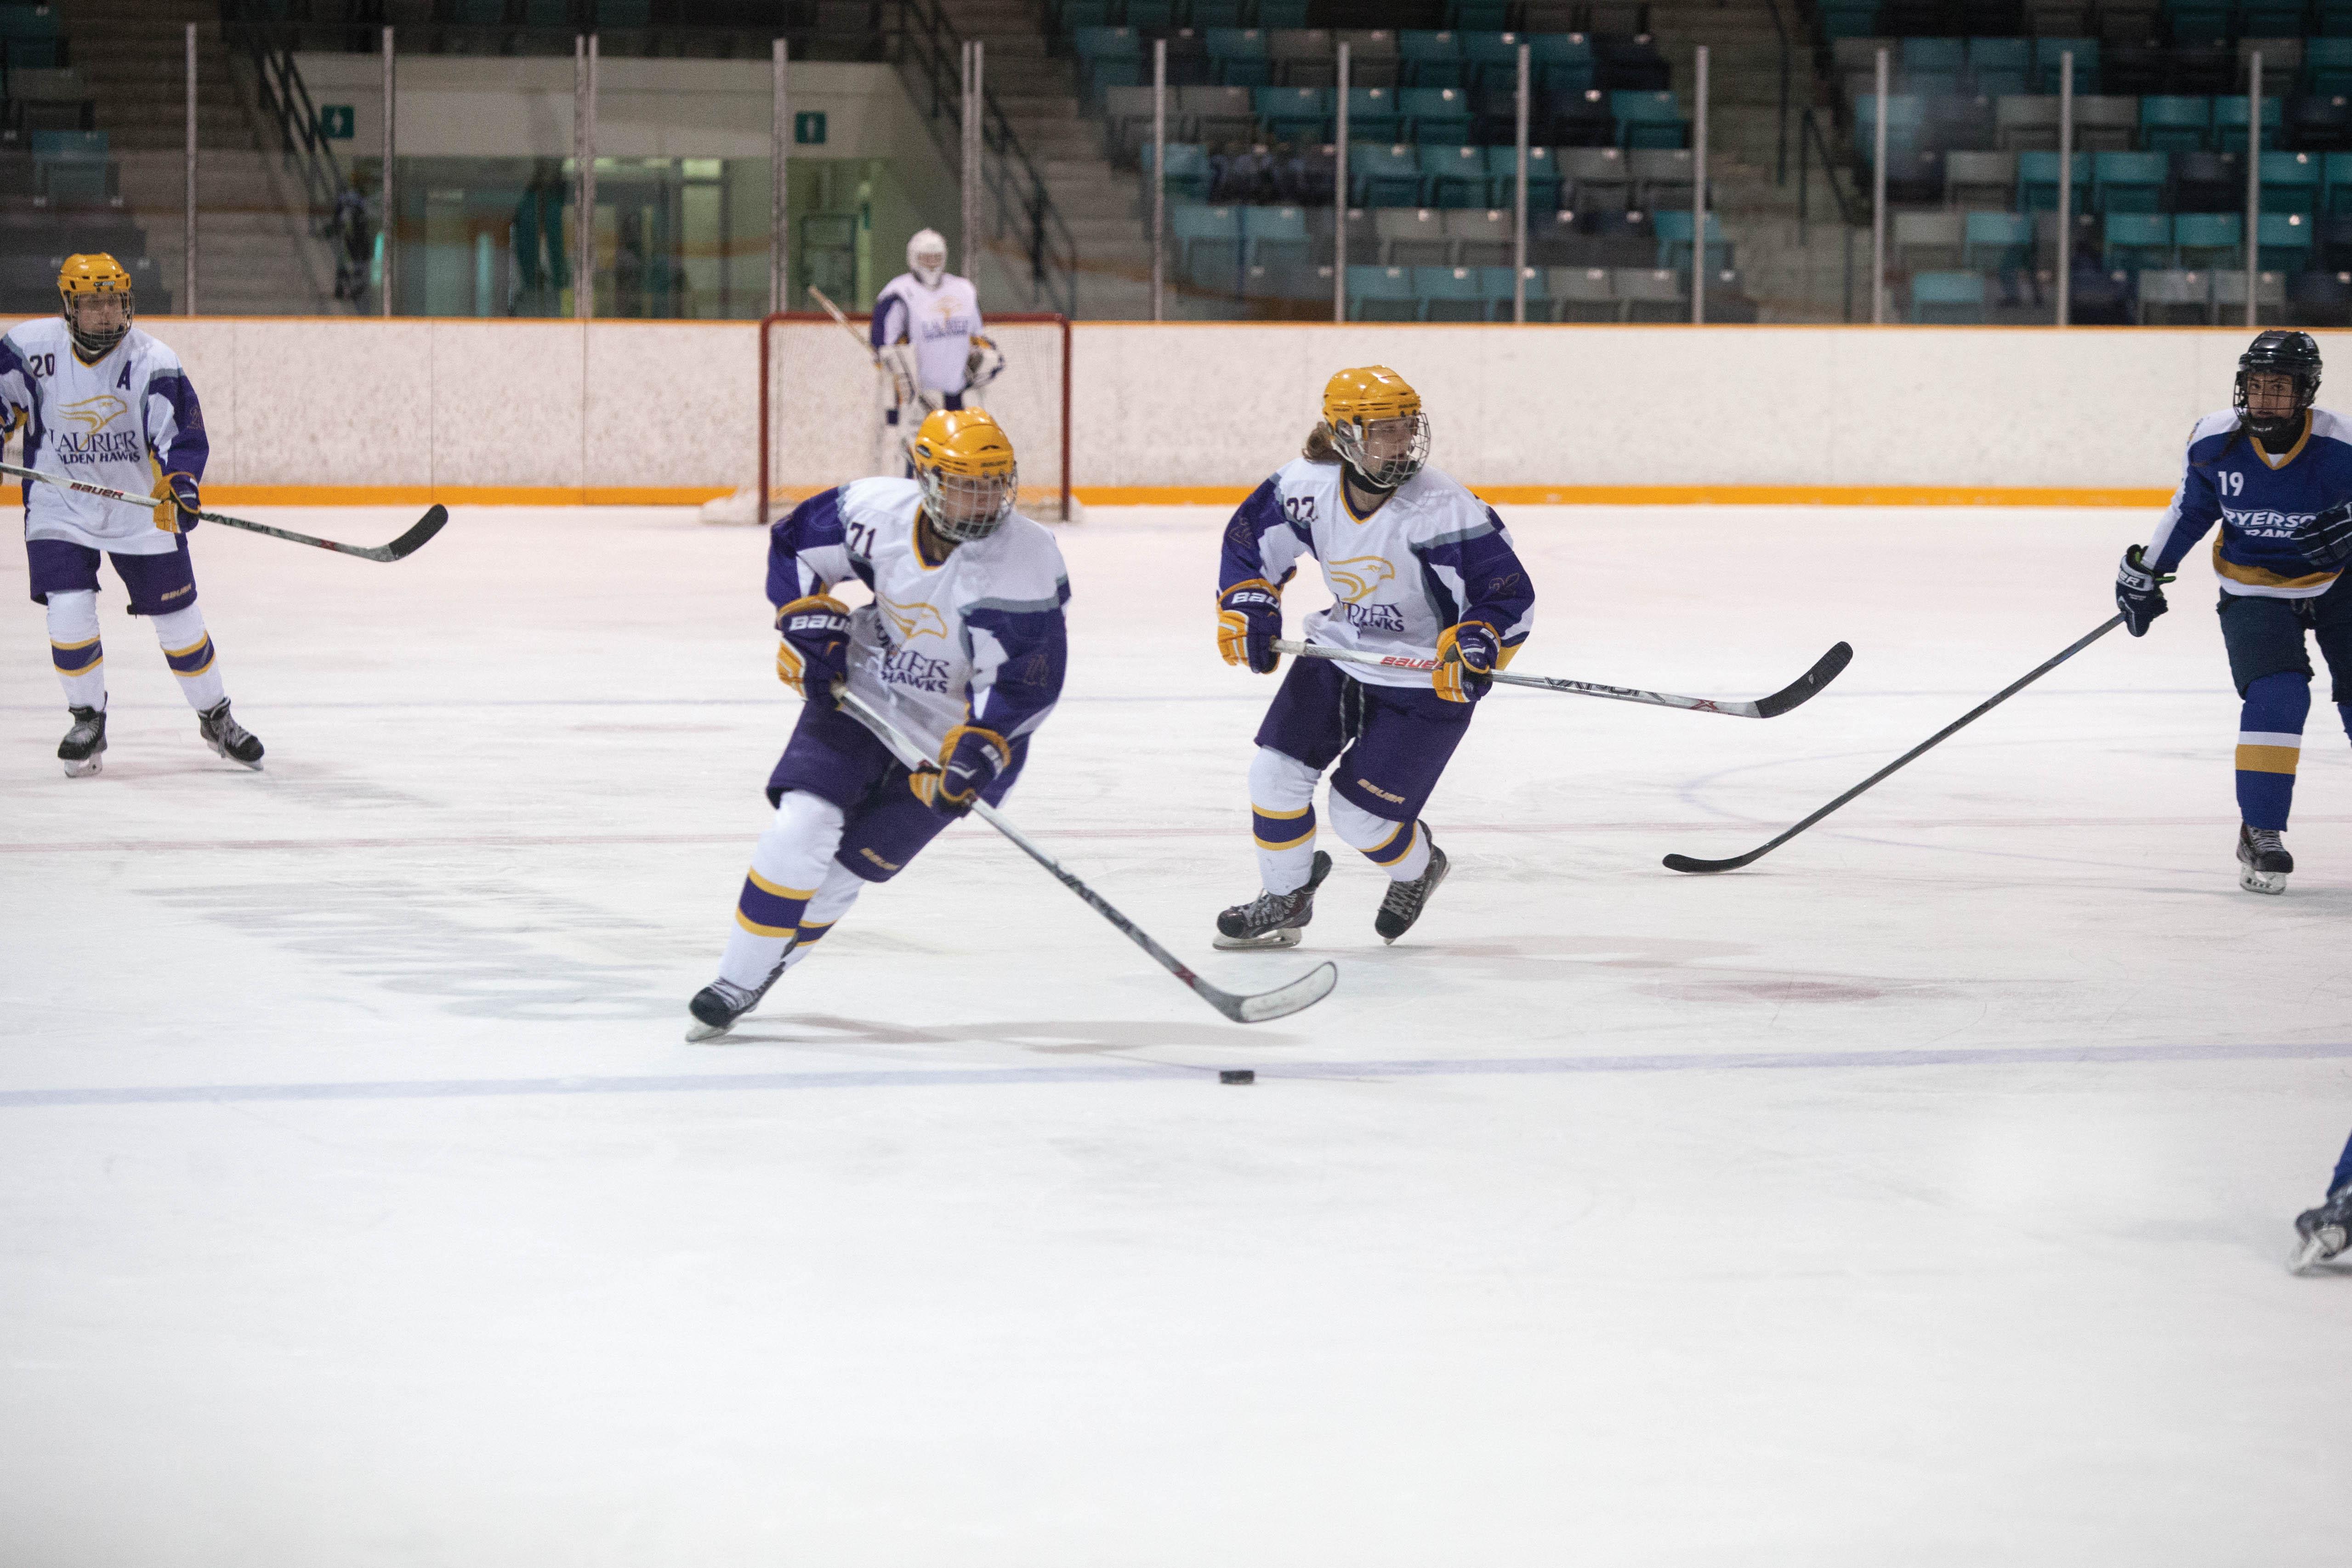 Two weeks after a torn meniscus, Lauren Webber returned to Golden Hawk hockey